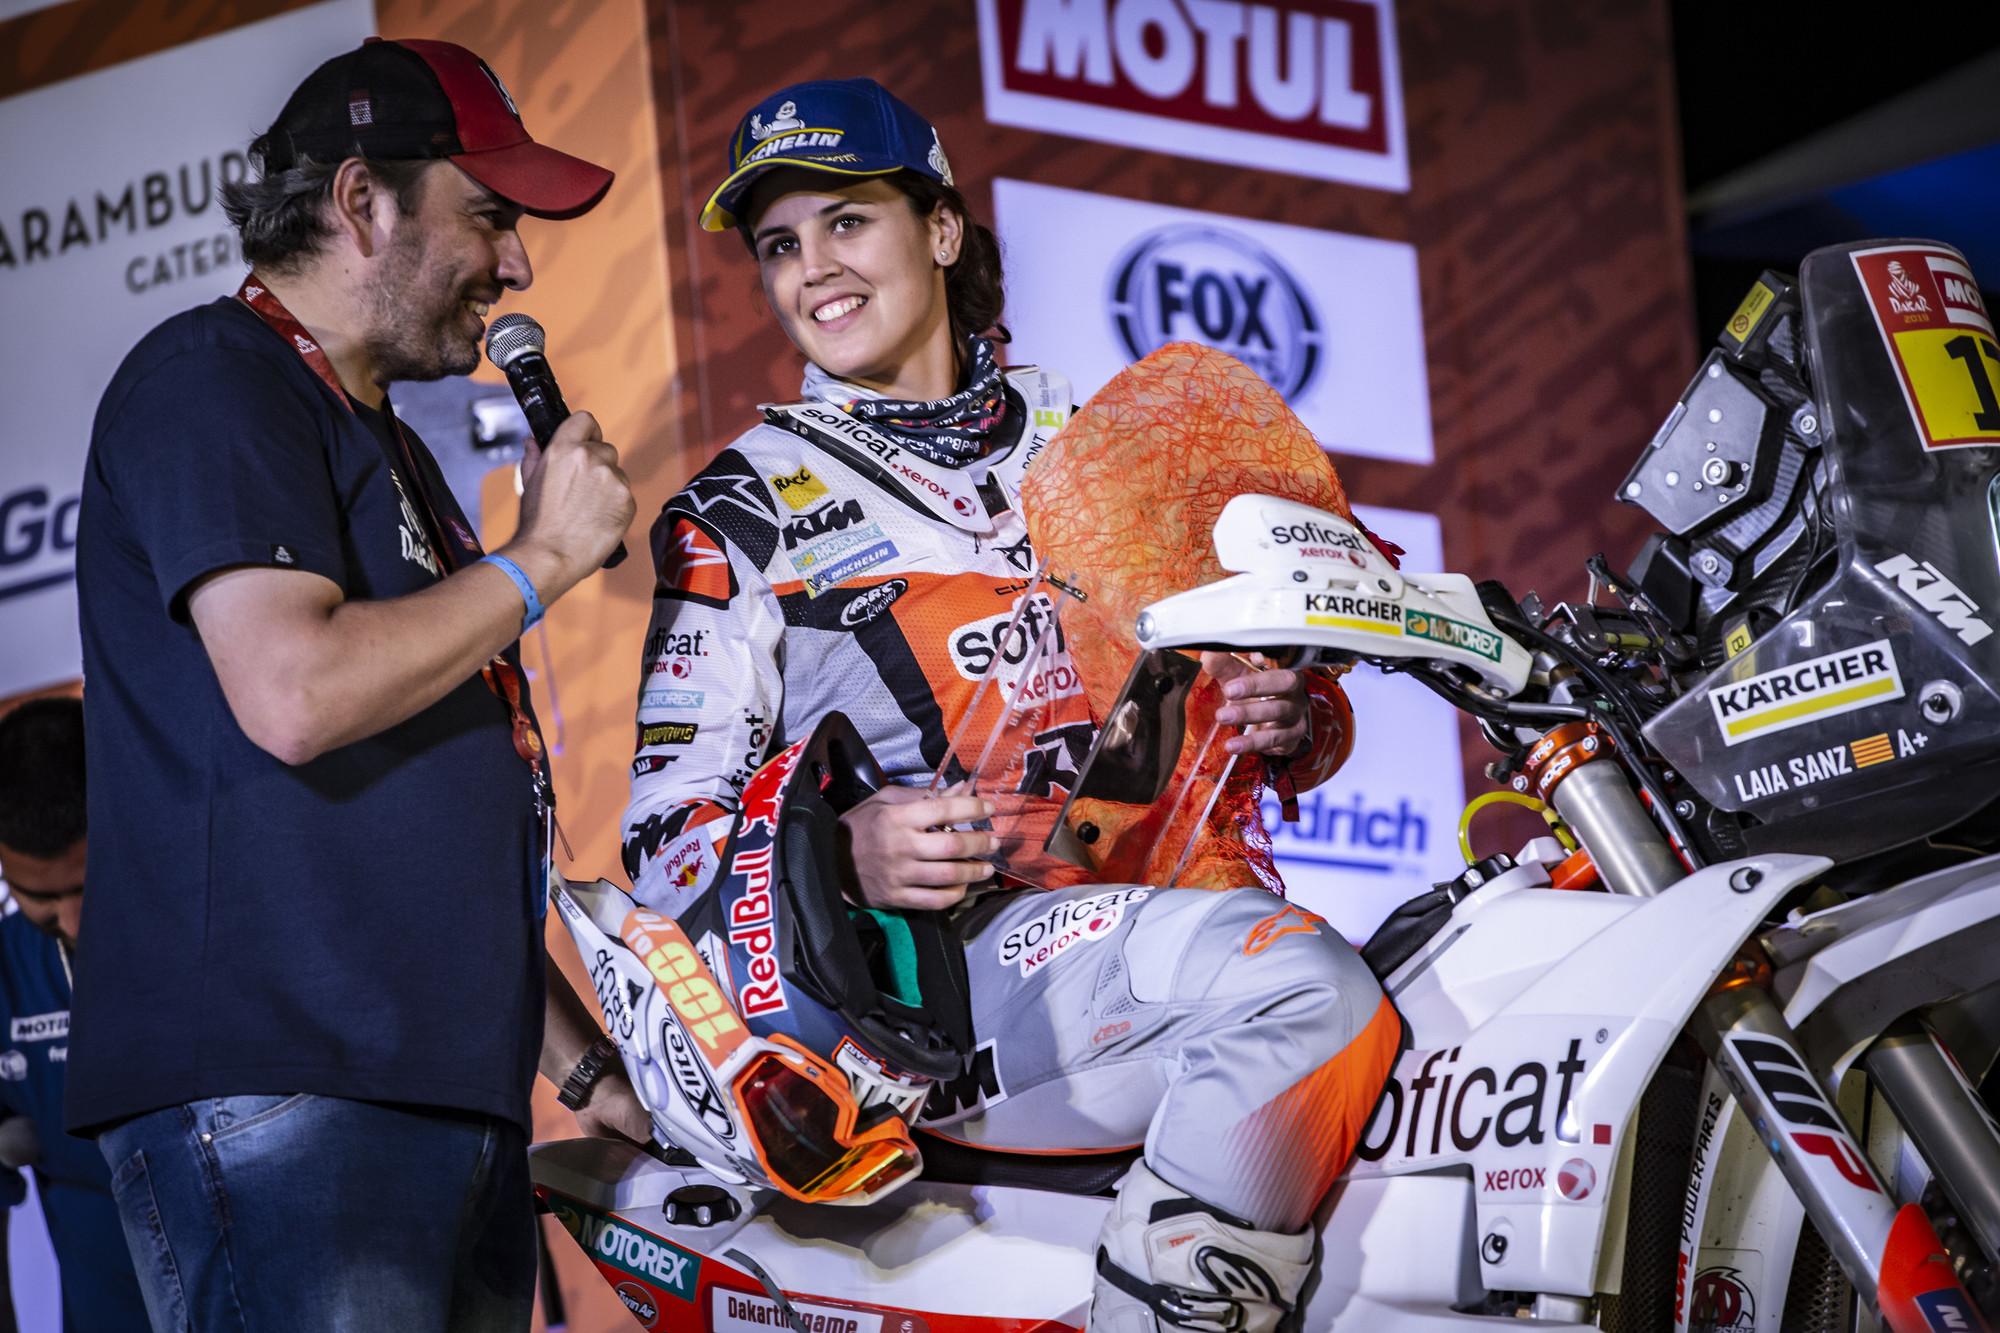 263398_laia.sanz_finish_Red Bull KTM Factory Racing_Dakar2019_492.jpg